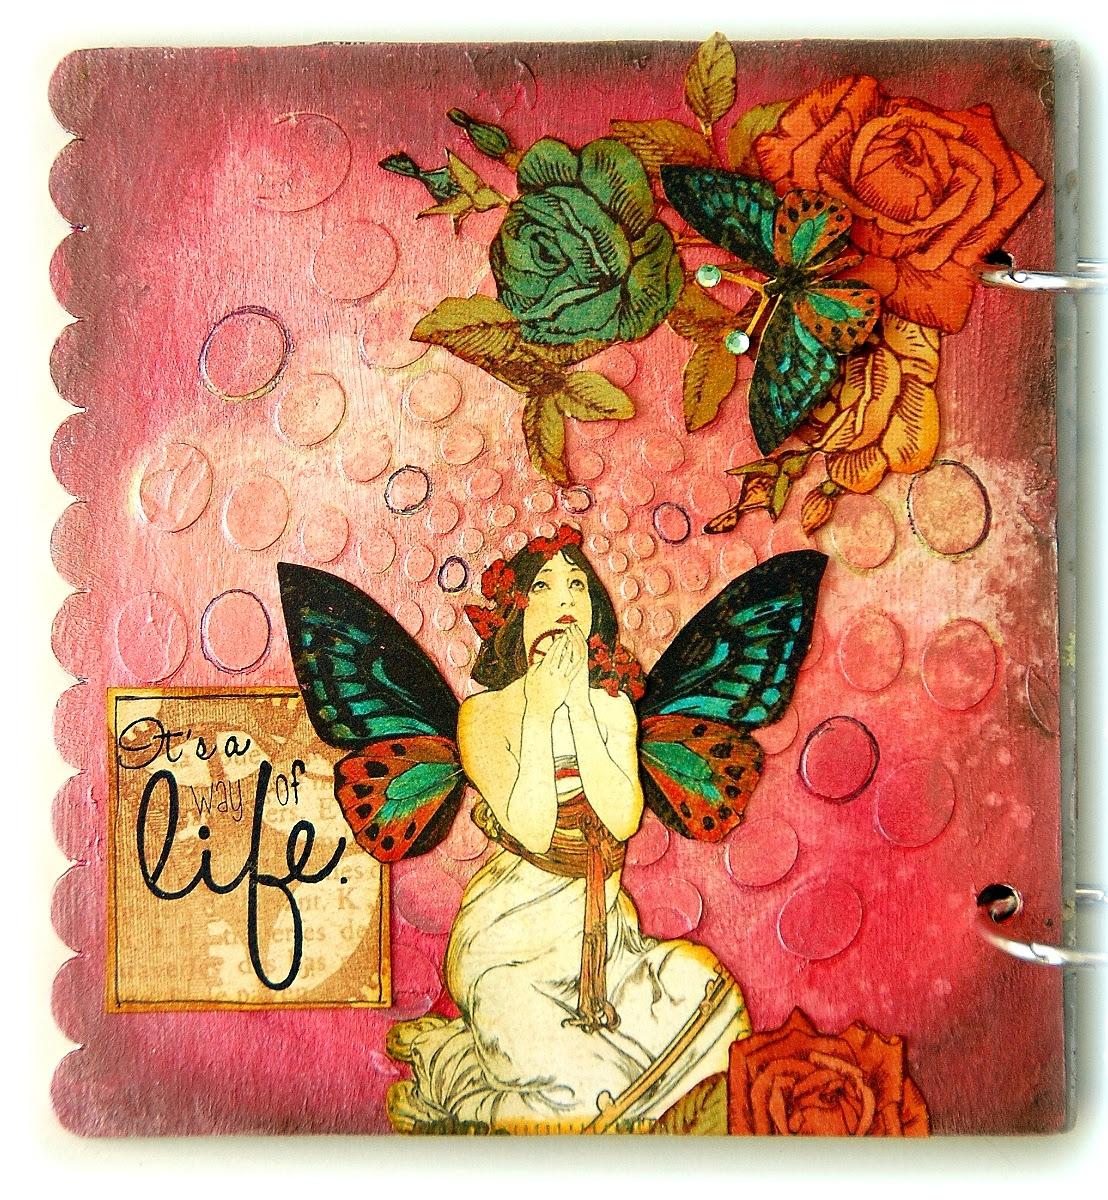 Be Free Mini Album by Irene Tan